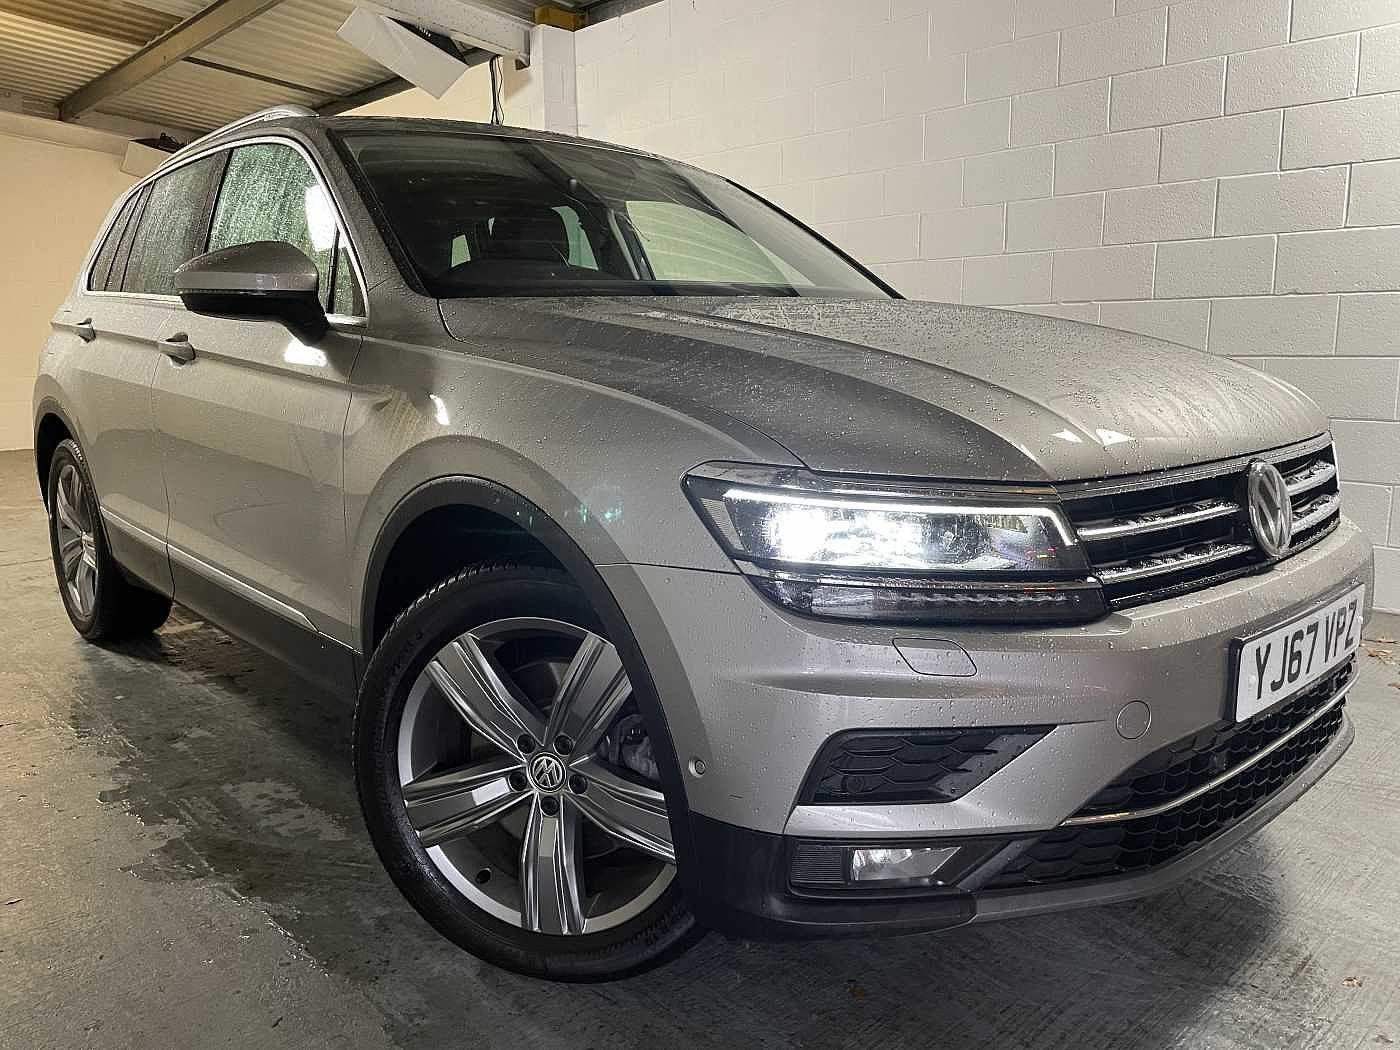 Volkswagen Tiguan 2.0 TDI SEL DSG 4Motion (s/s) 5dr